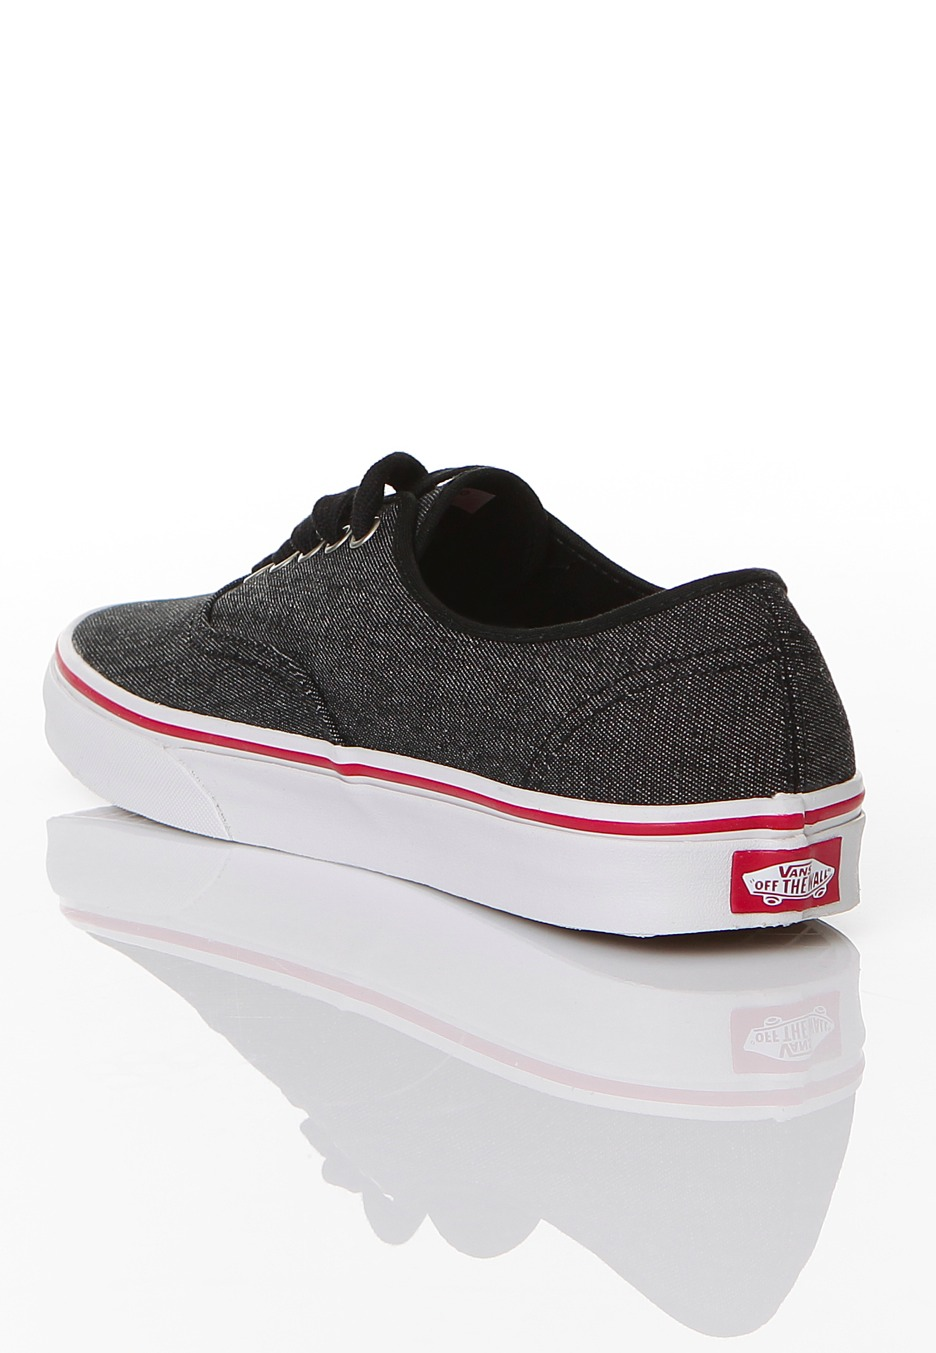 6c211997e935c0 sepatuwani-taterbaru  Authentic Vans Shoes Images